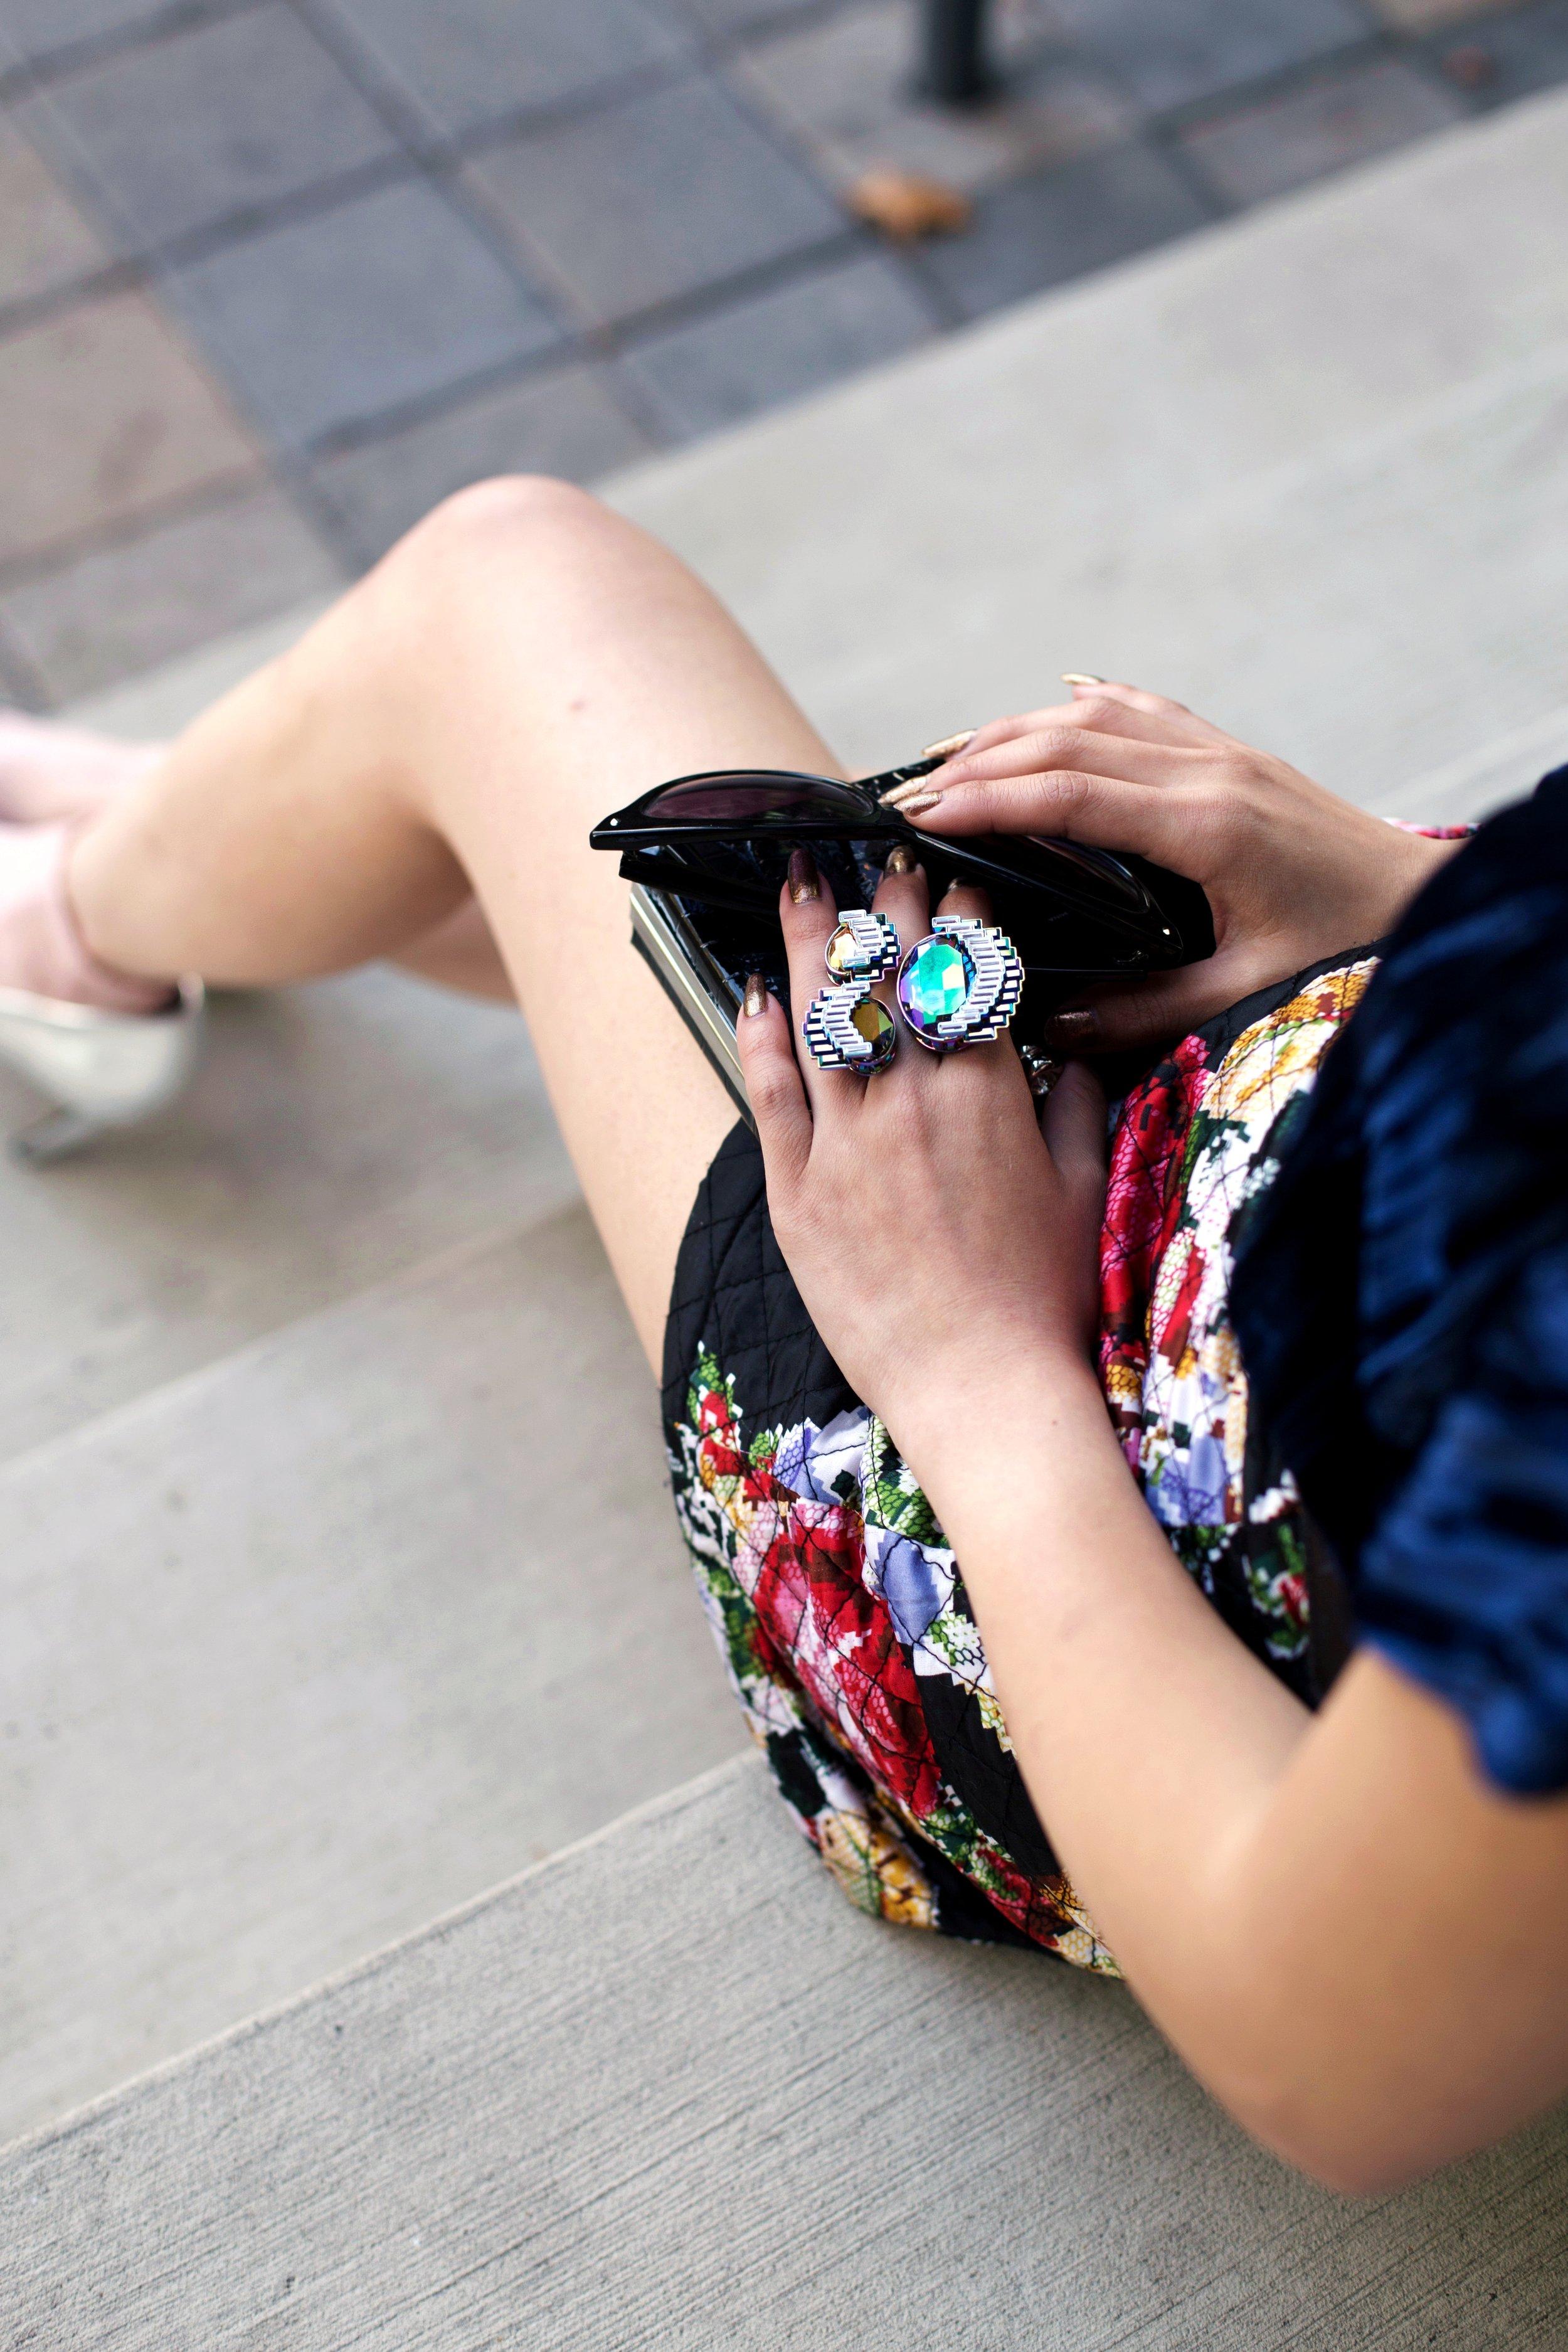 ZARA Blue Velvet Top_Forever 21 Floral Print Mini Skirt_Mango Patent Belt_Kate Spade Sheer Ankle Socks_Qupid Silver Pumps_Aldo Cateye Sunglasses_Swarovski Fluorescent Necklace & Fluorescent Ring_Aika's Love Closet_Seattle Fashion Blogger_Japanese_Lavender Hair_Mermaid Hair 12